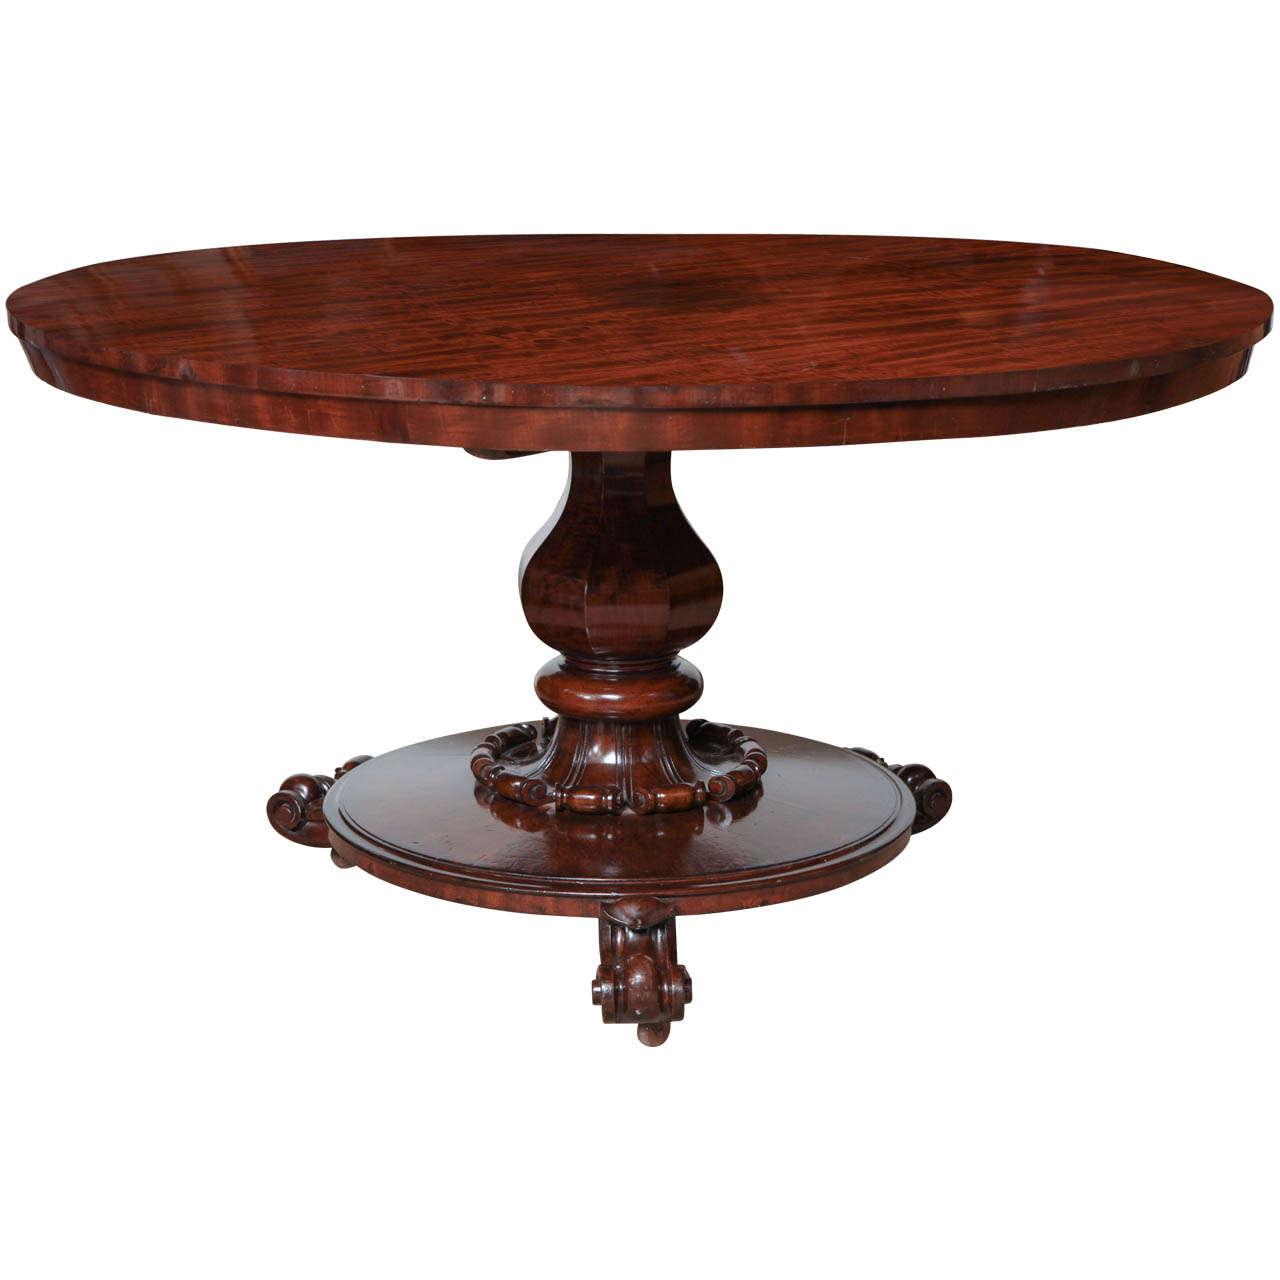 19th Century Irish Mahogany Centre Pedestal Table For Sale At 1stdibs